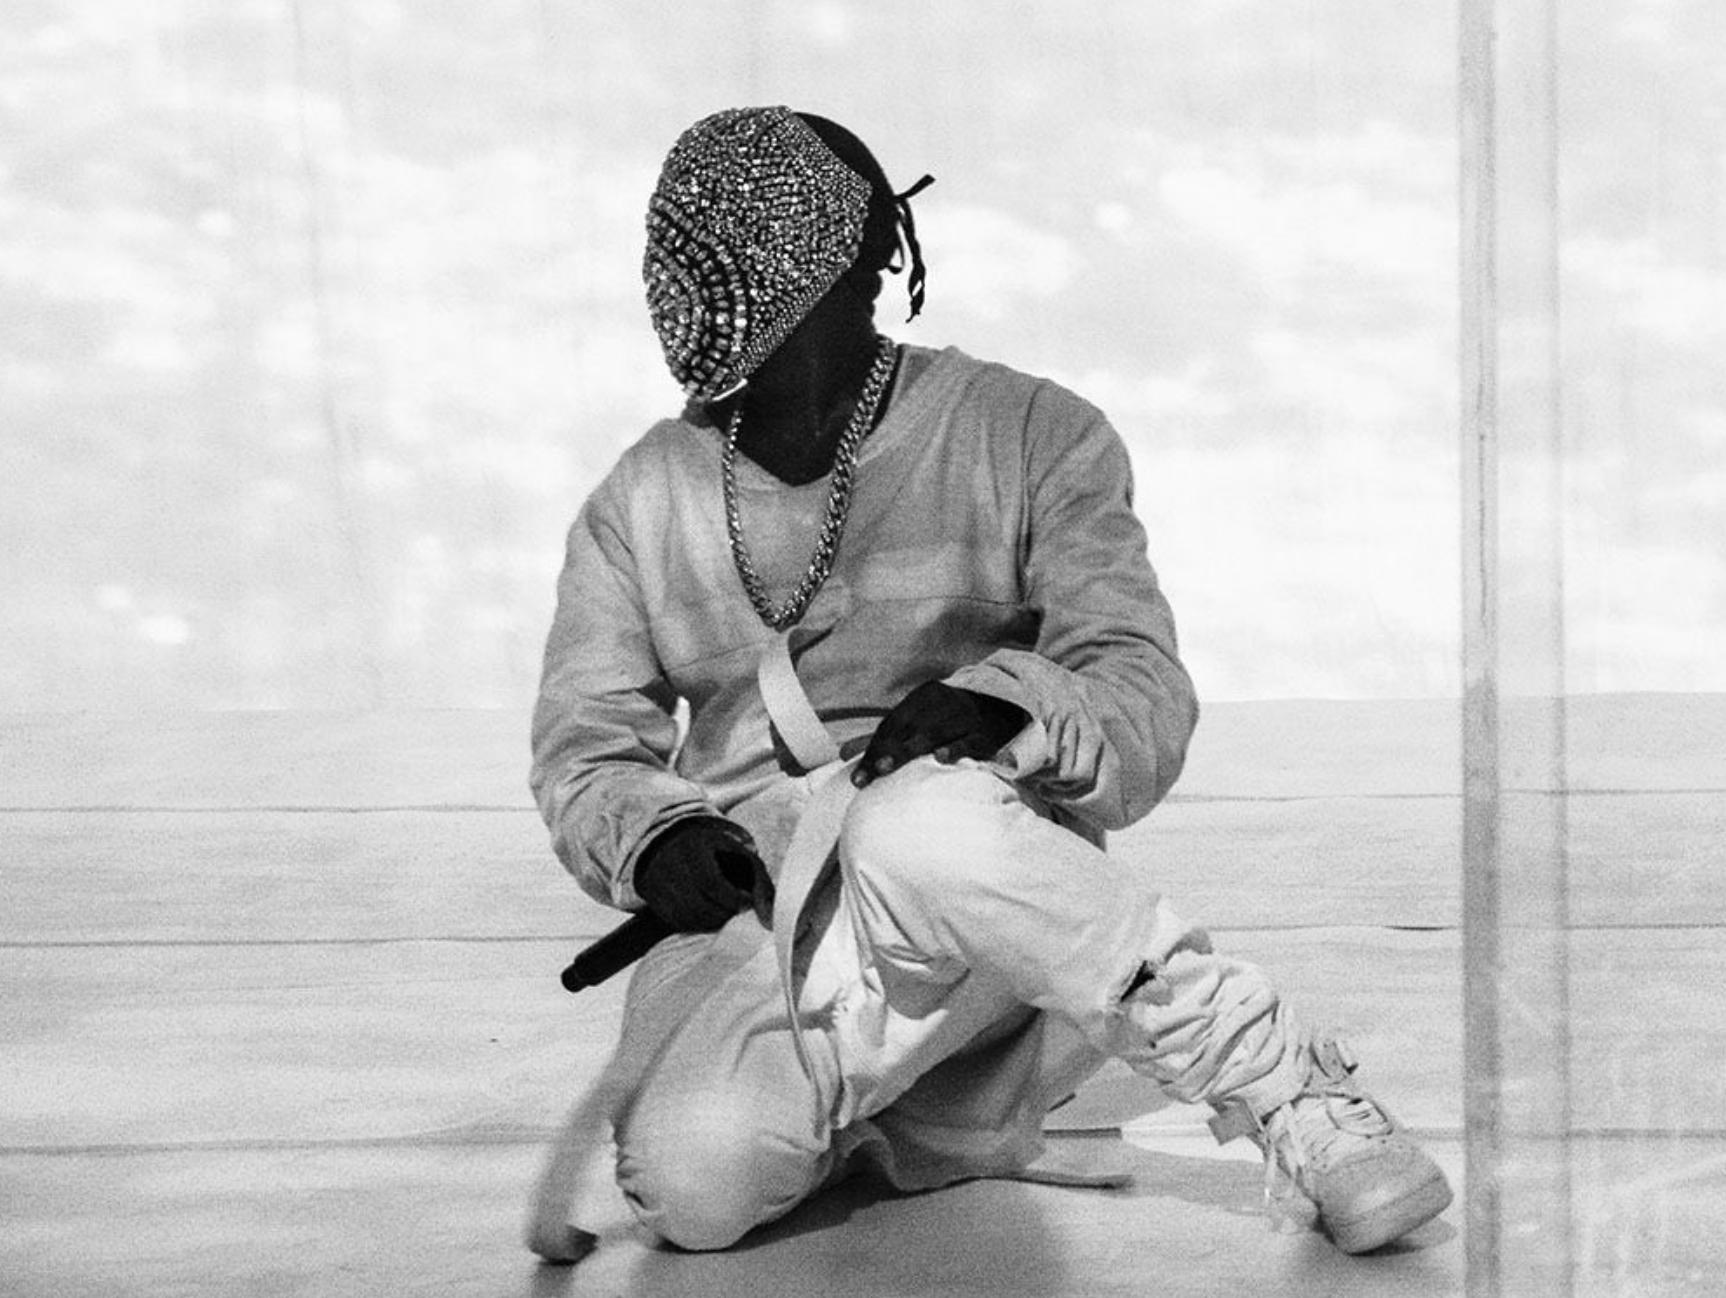 Kanye West 'YEEZUS' tour (2013) creative direction: Virgil Abloh & Donda